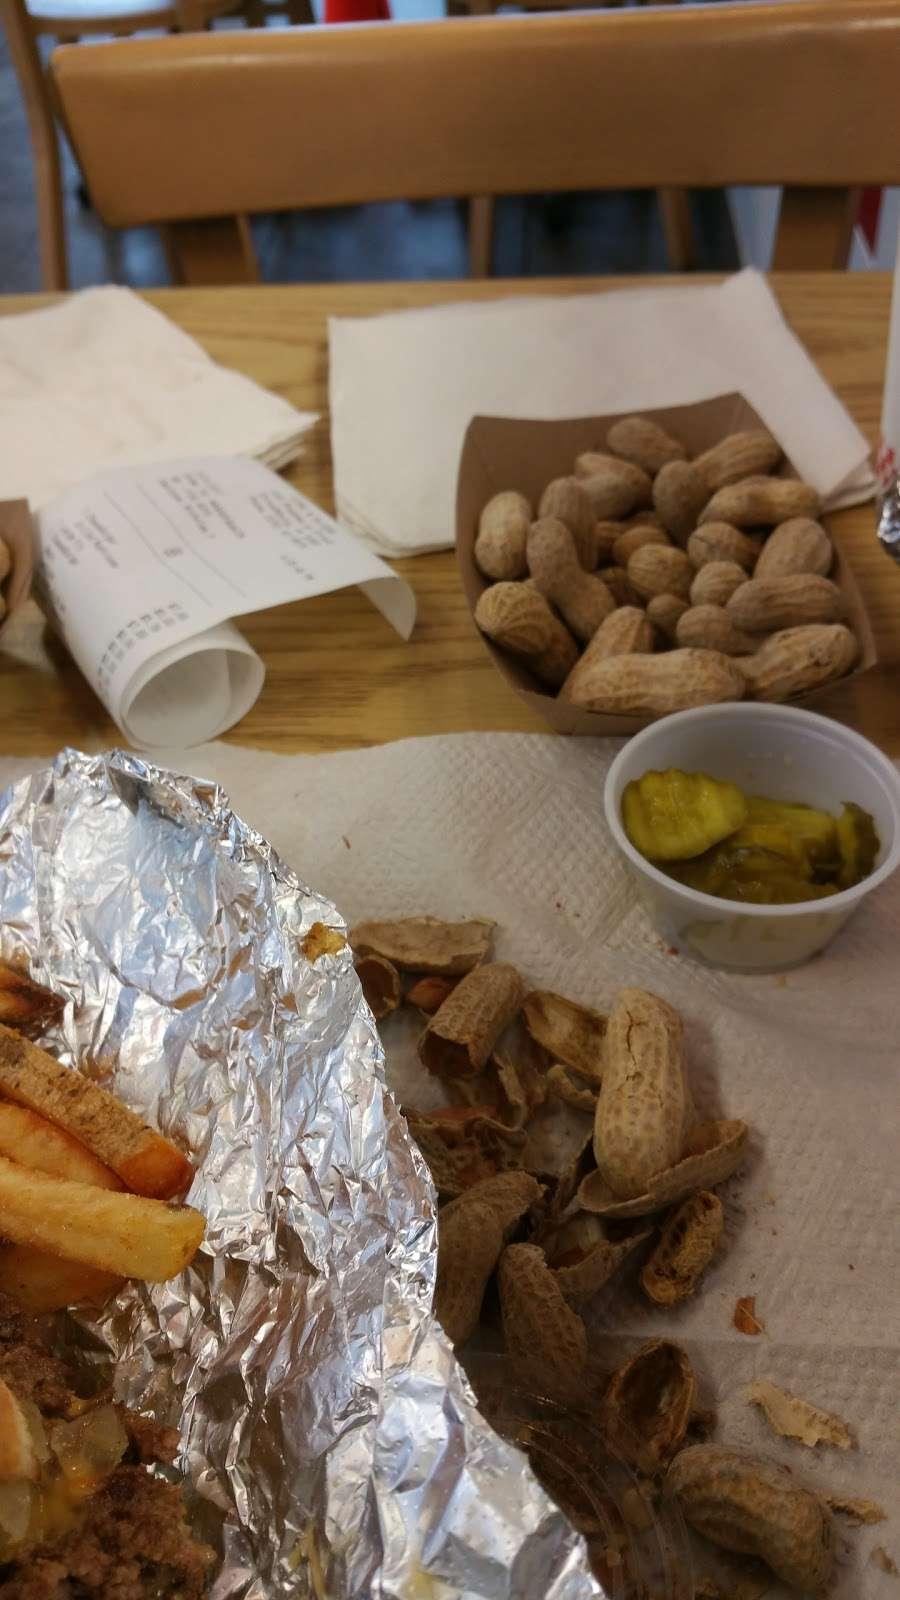 Five Guys - meal takeaway  | Photo 6 of 10 | Address: 361 Charles Way, Stroudsburg, PA 18360, USA | Phone: (570) 421-9804